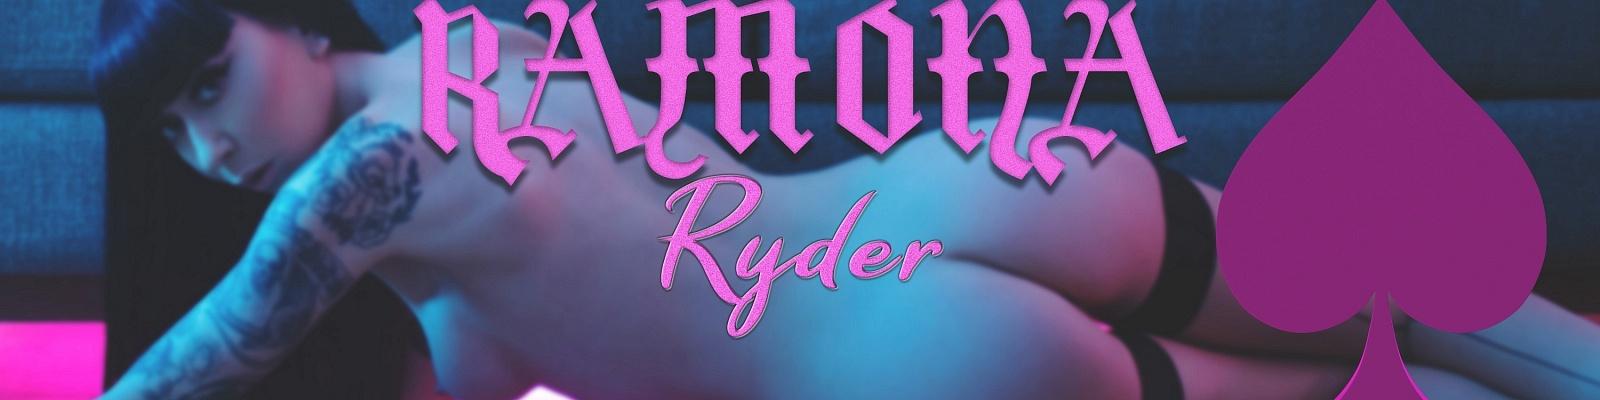 Mistress Ramona Ryder NYC